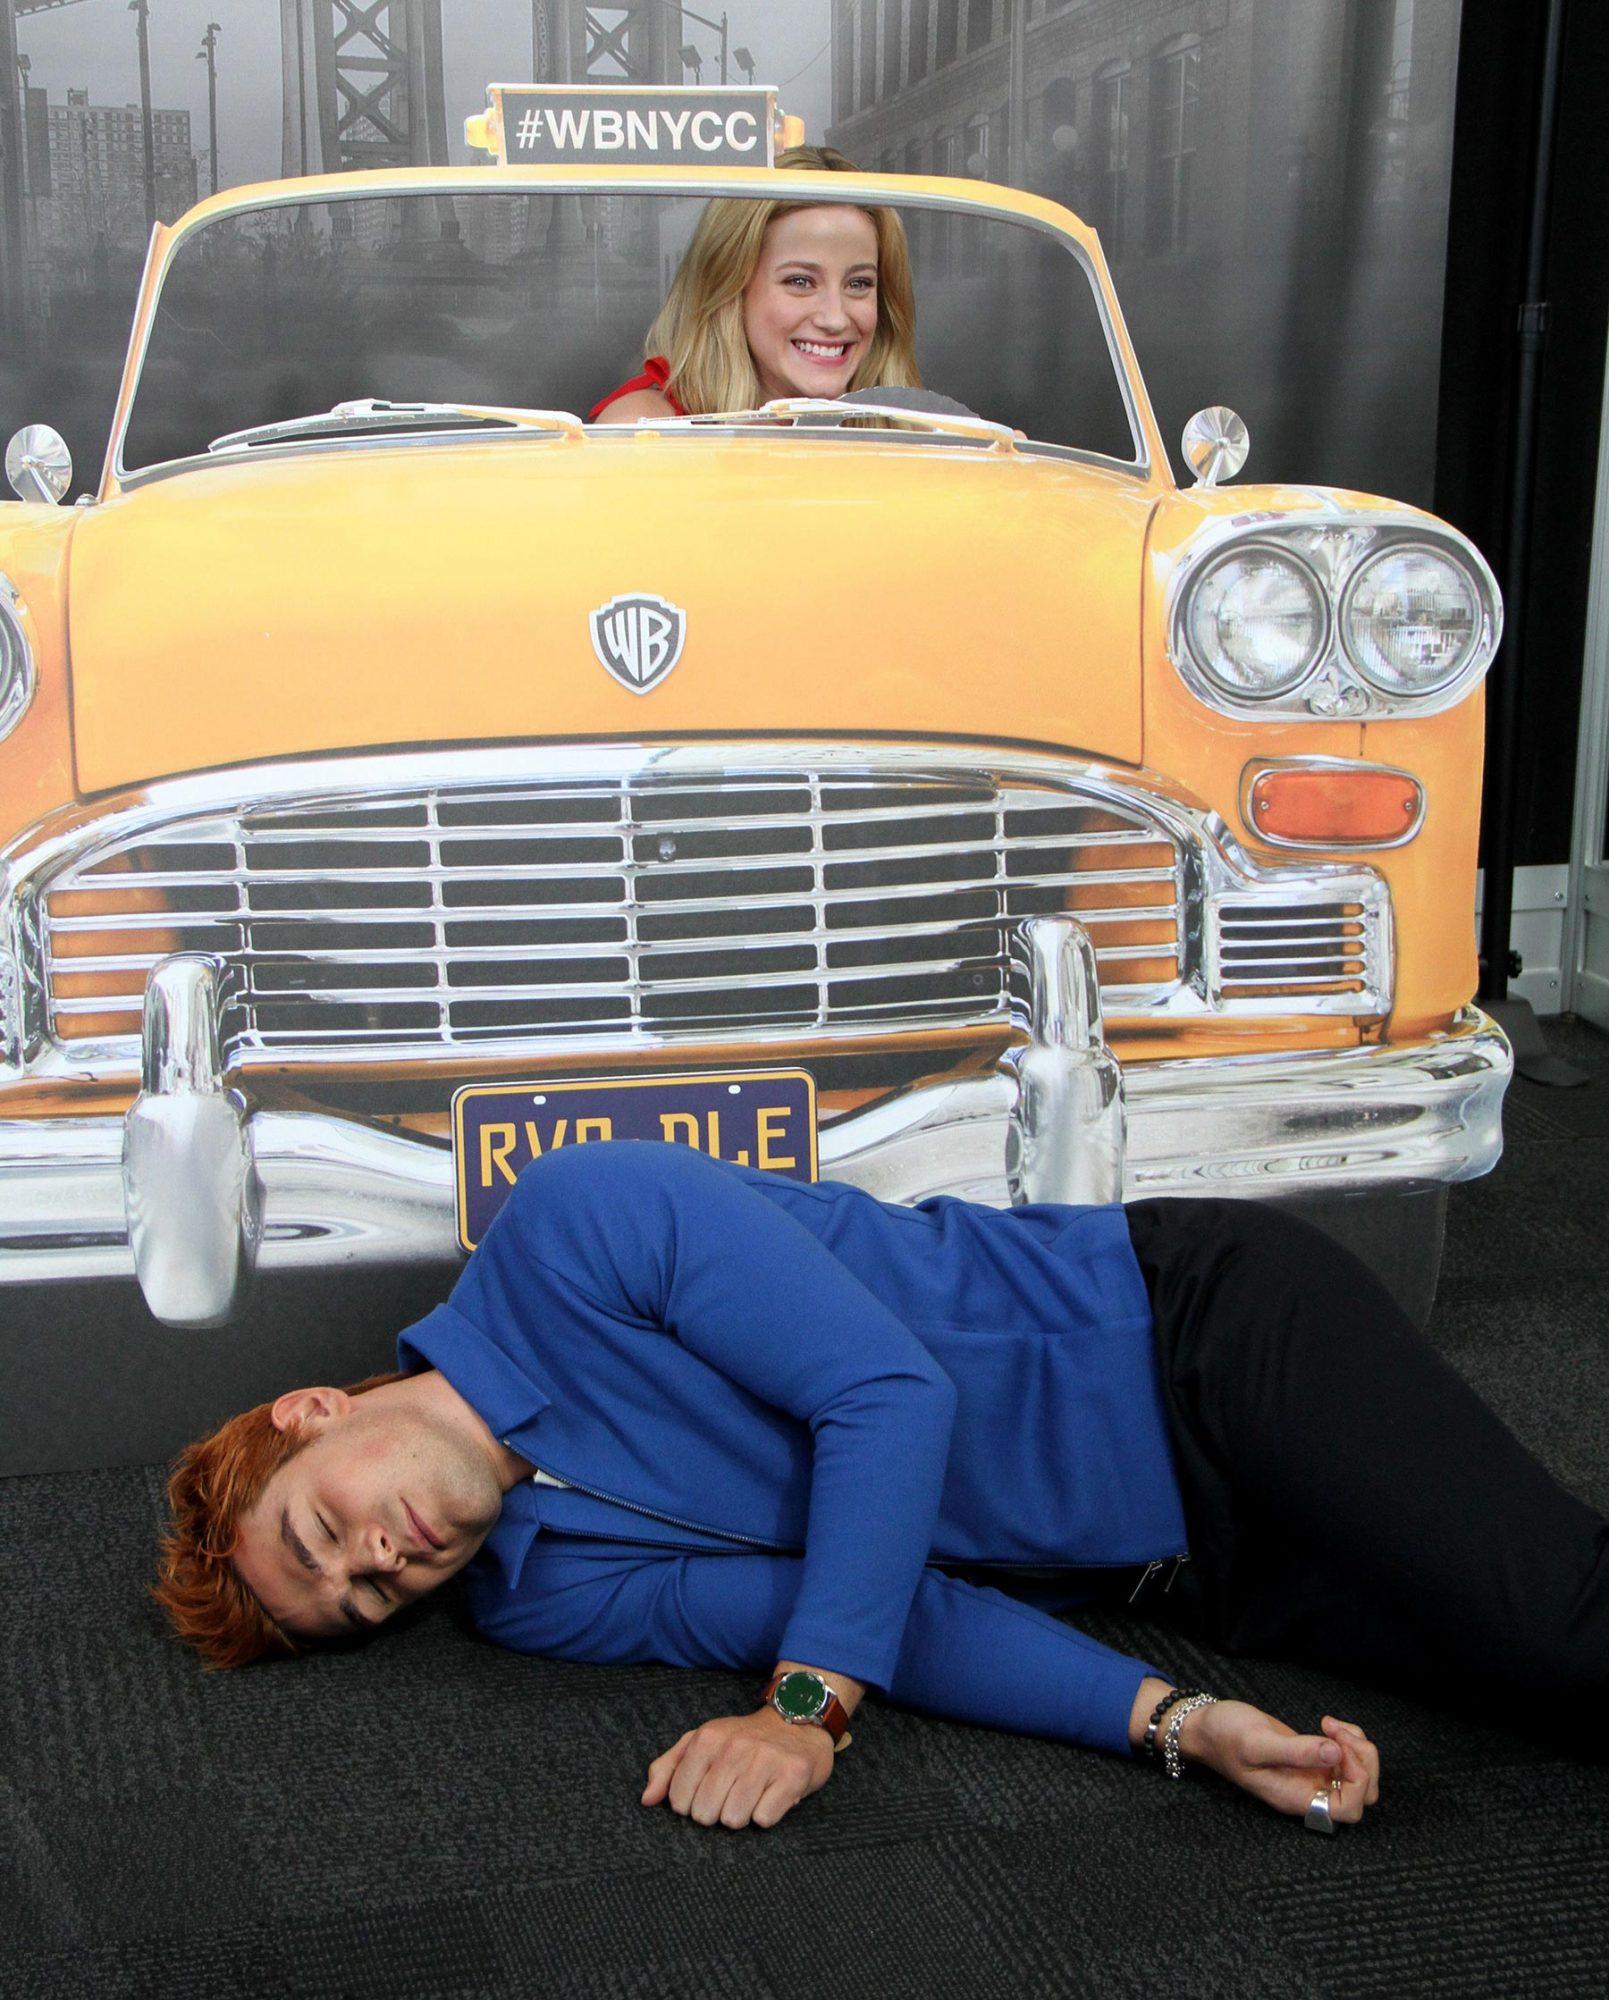 'Riverdale' TV show panel, New York Comic Con, USA - 07 Oct 2018